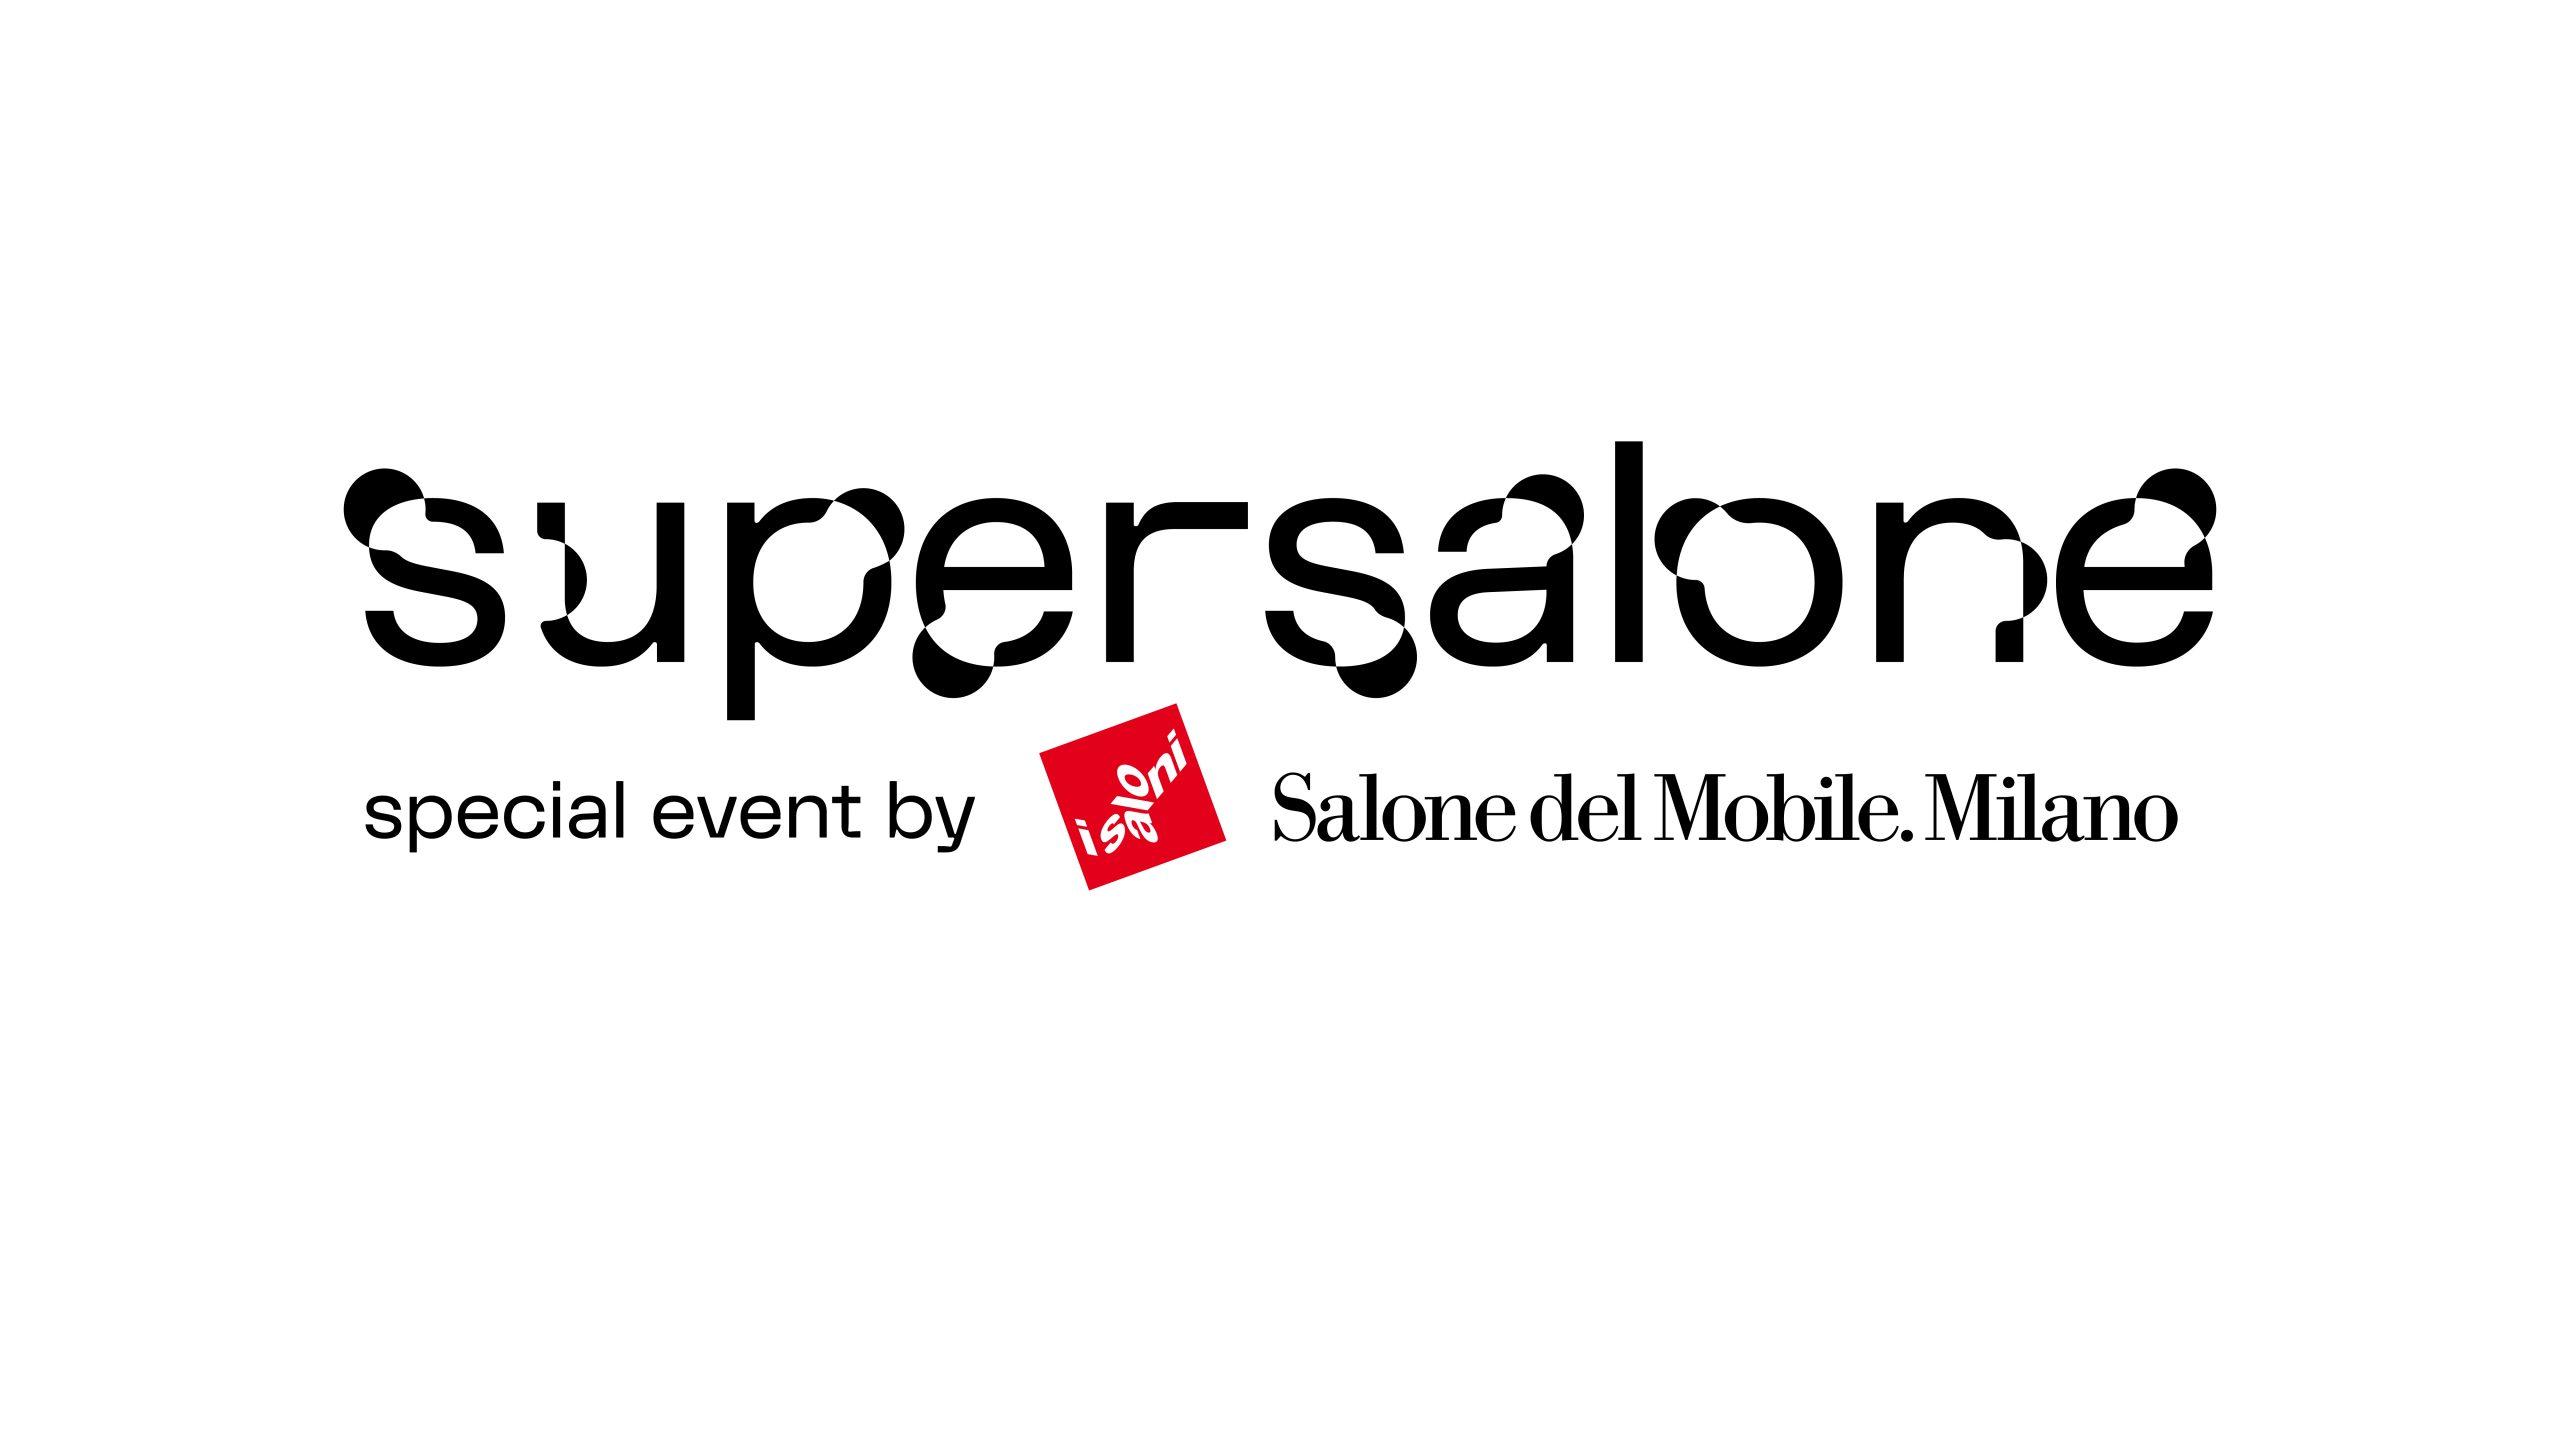 supersalone のキーワード「デザイン、共有、持続可能」 <br>安全な見本市 目指す